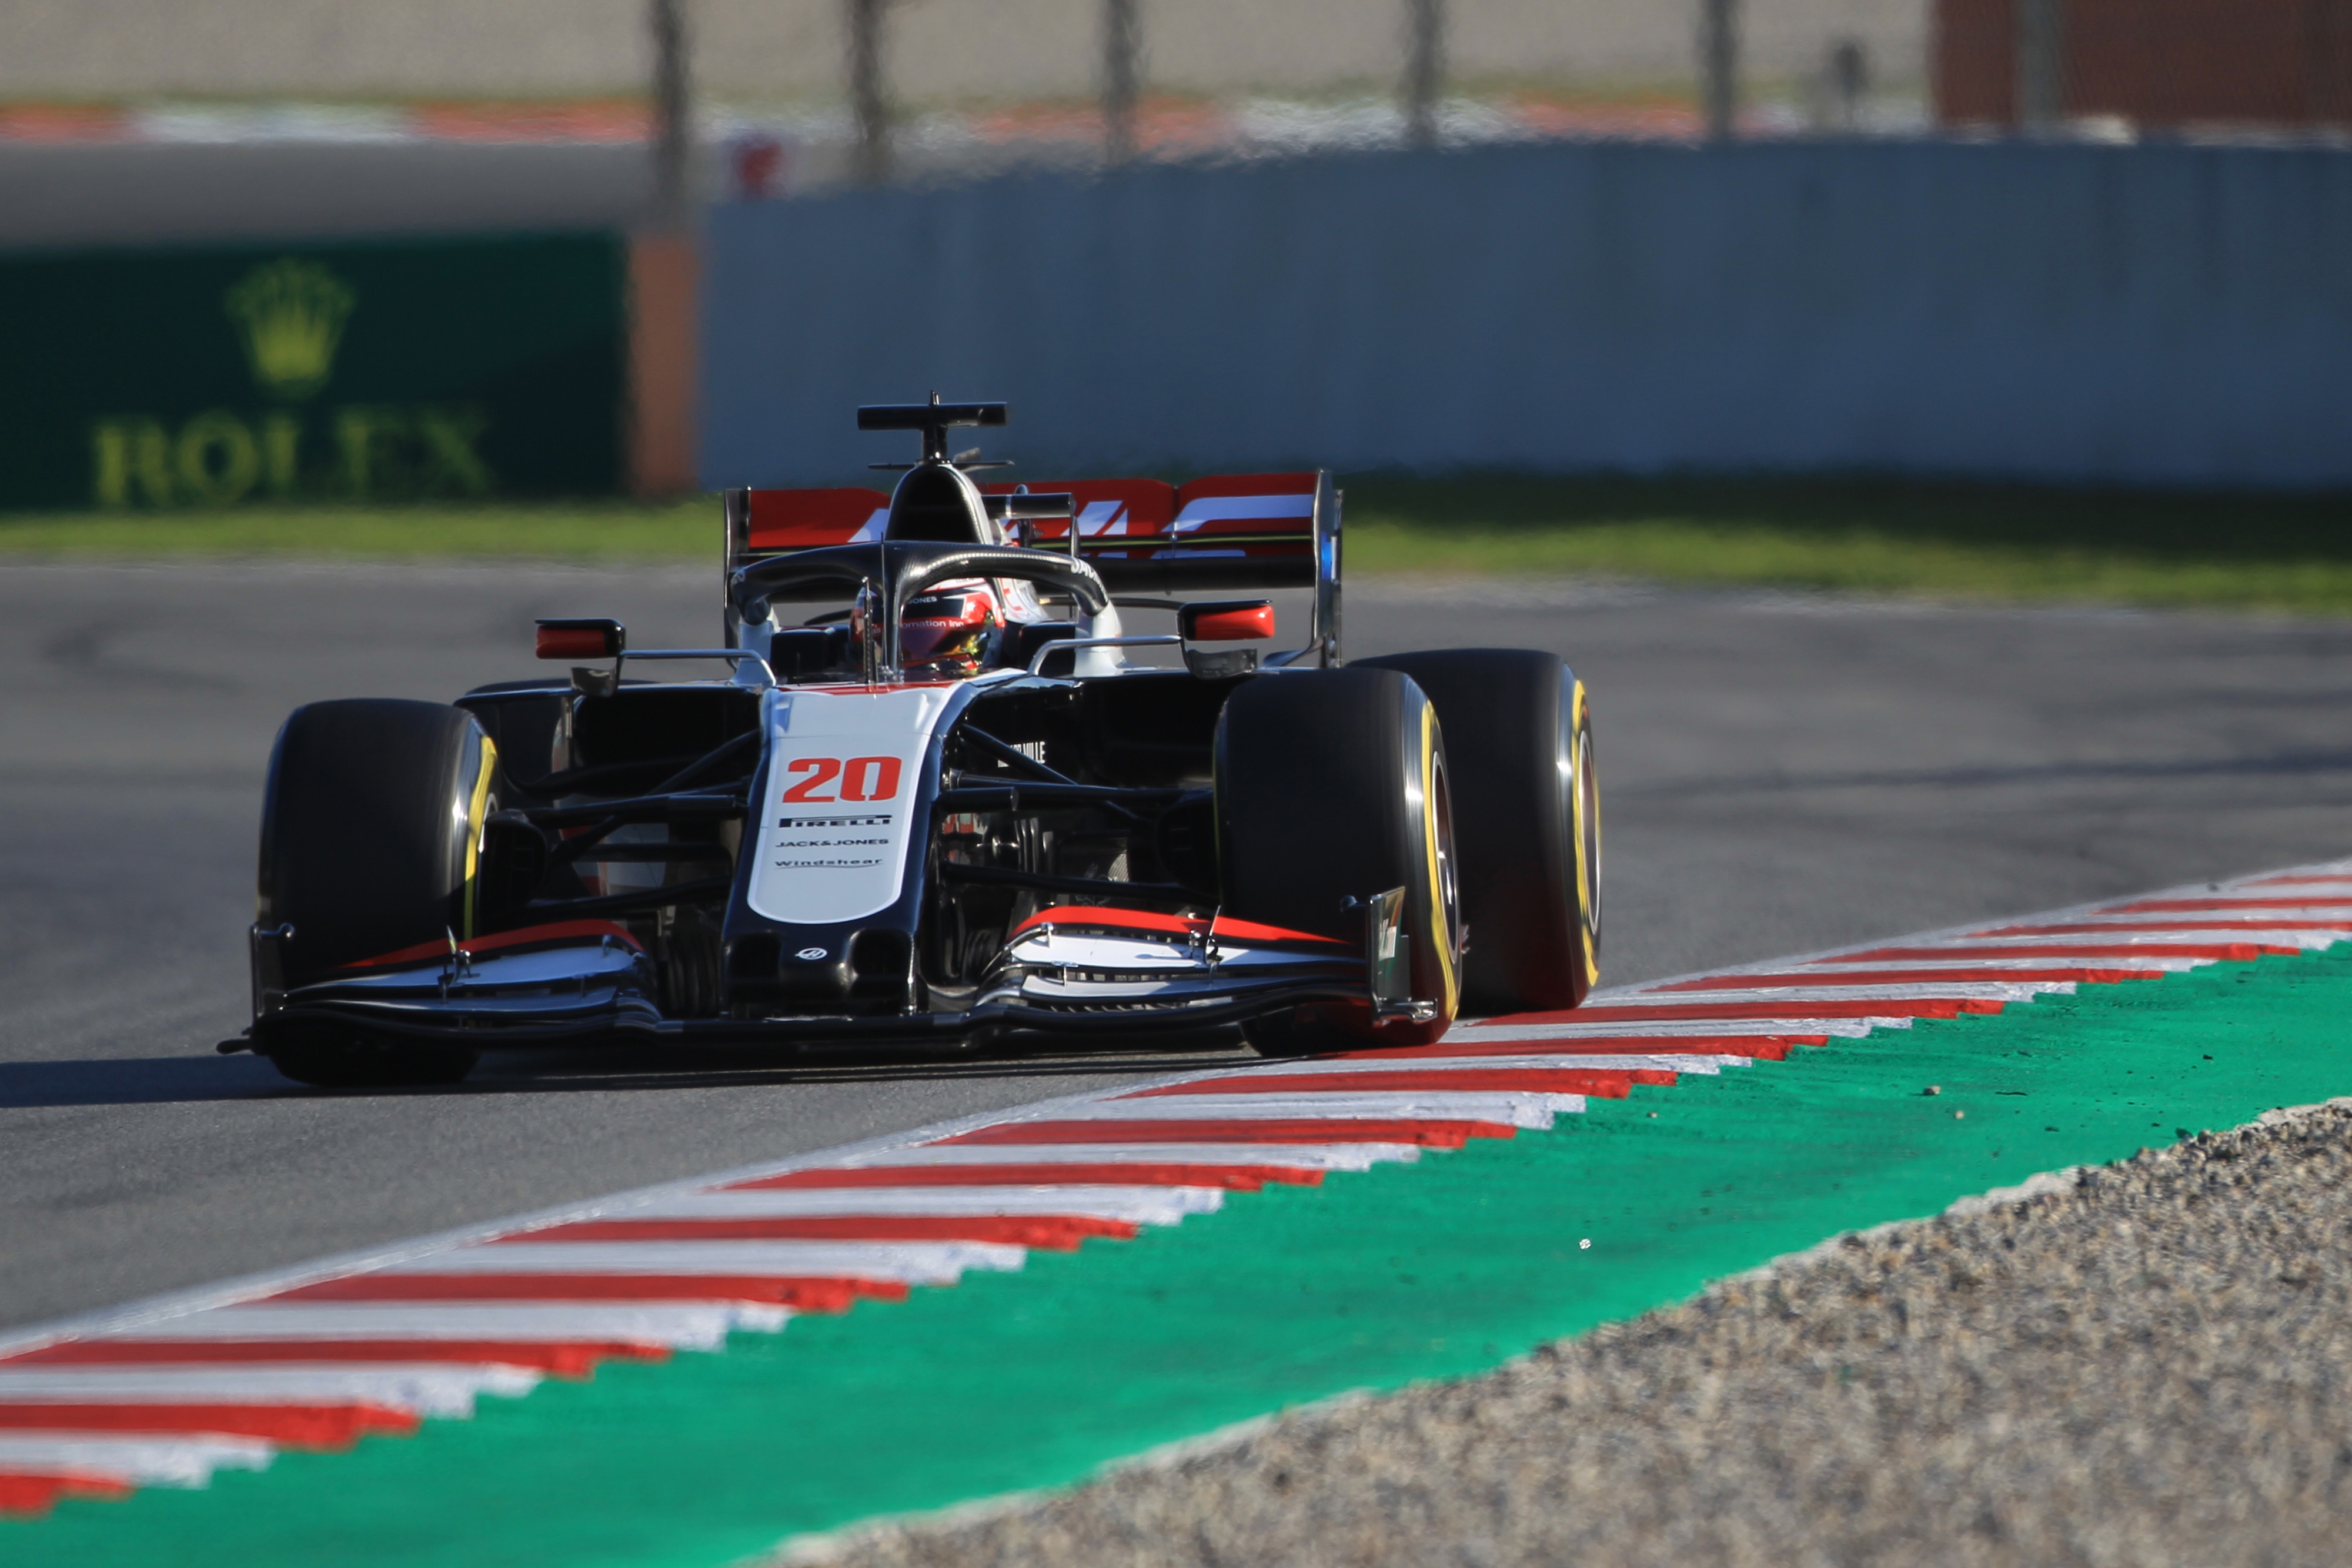 F1 Formula 1 Haas Kevin Magnussen